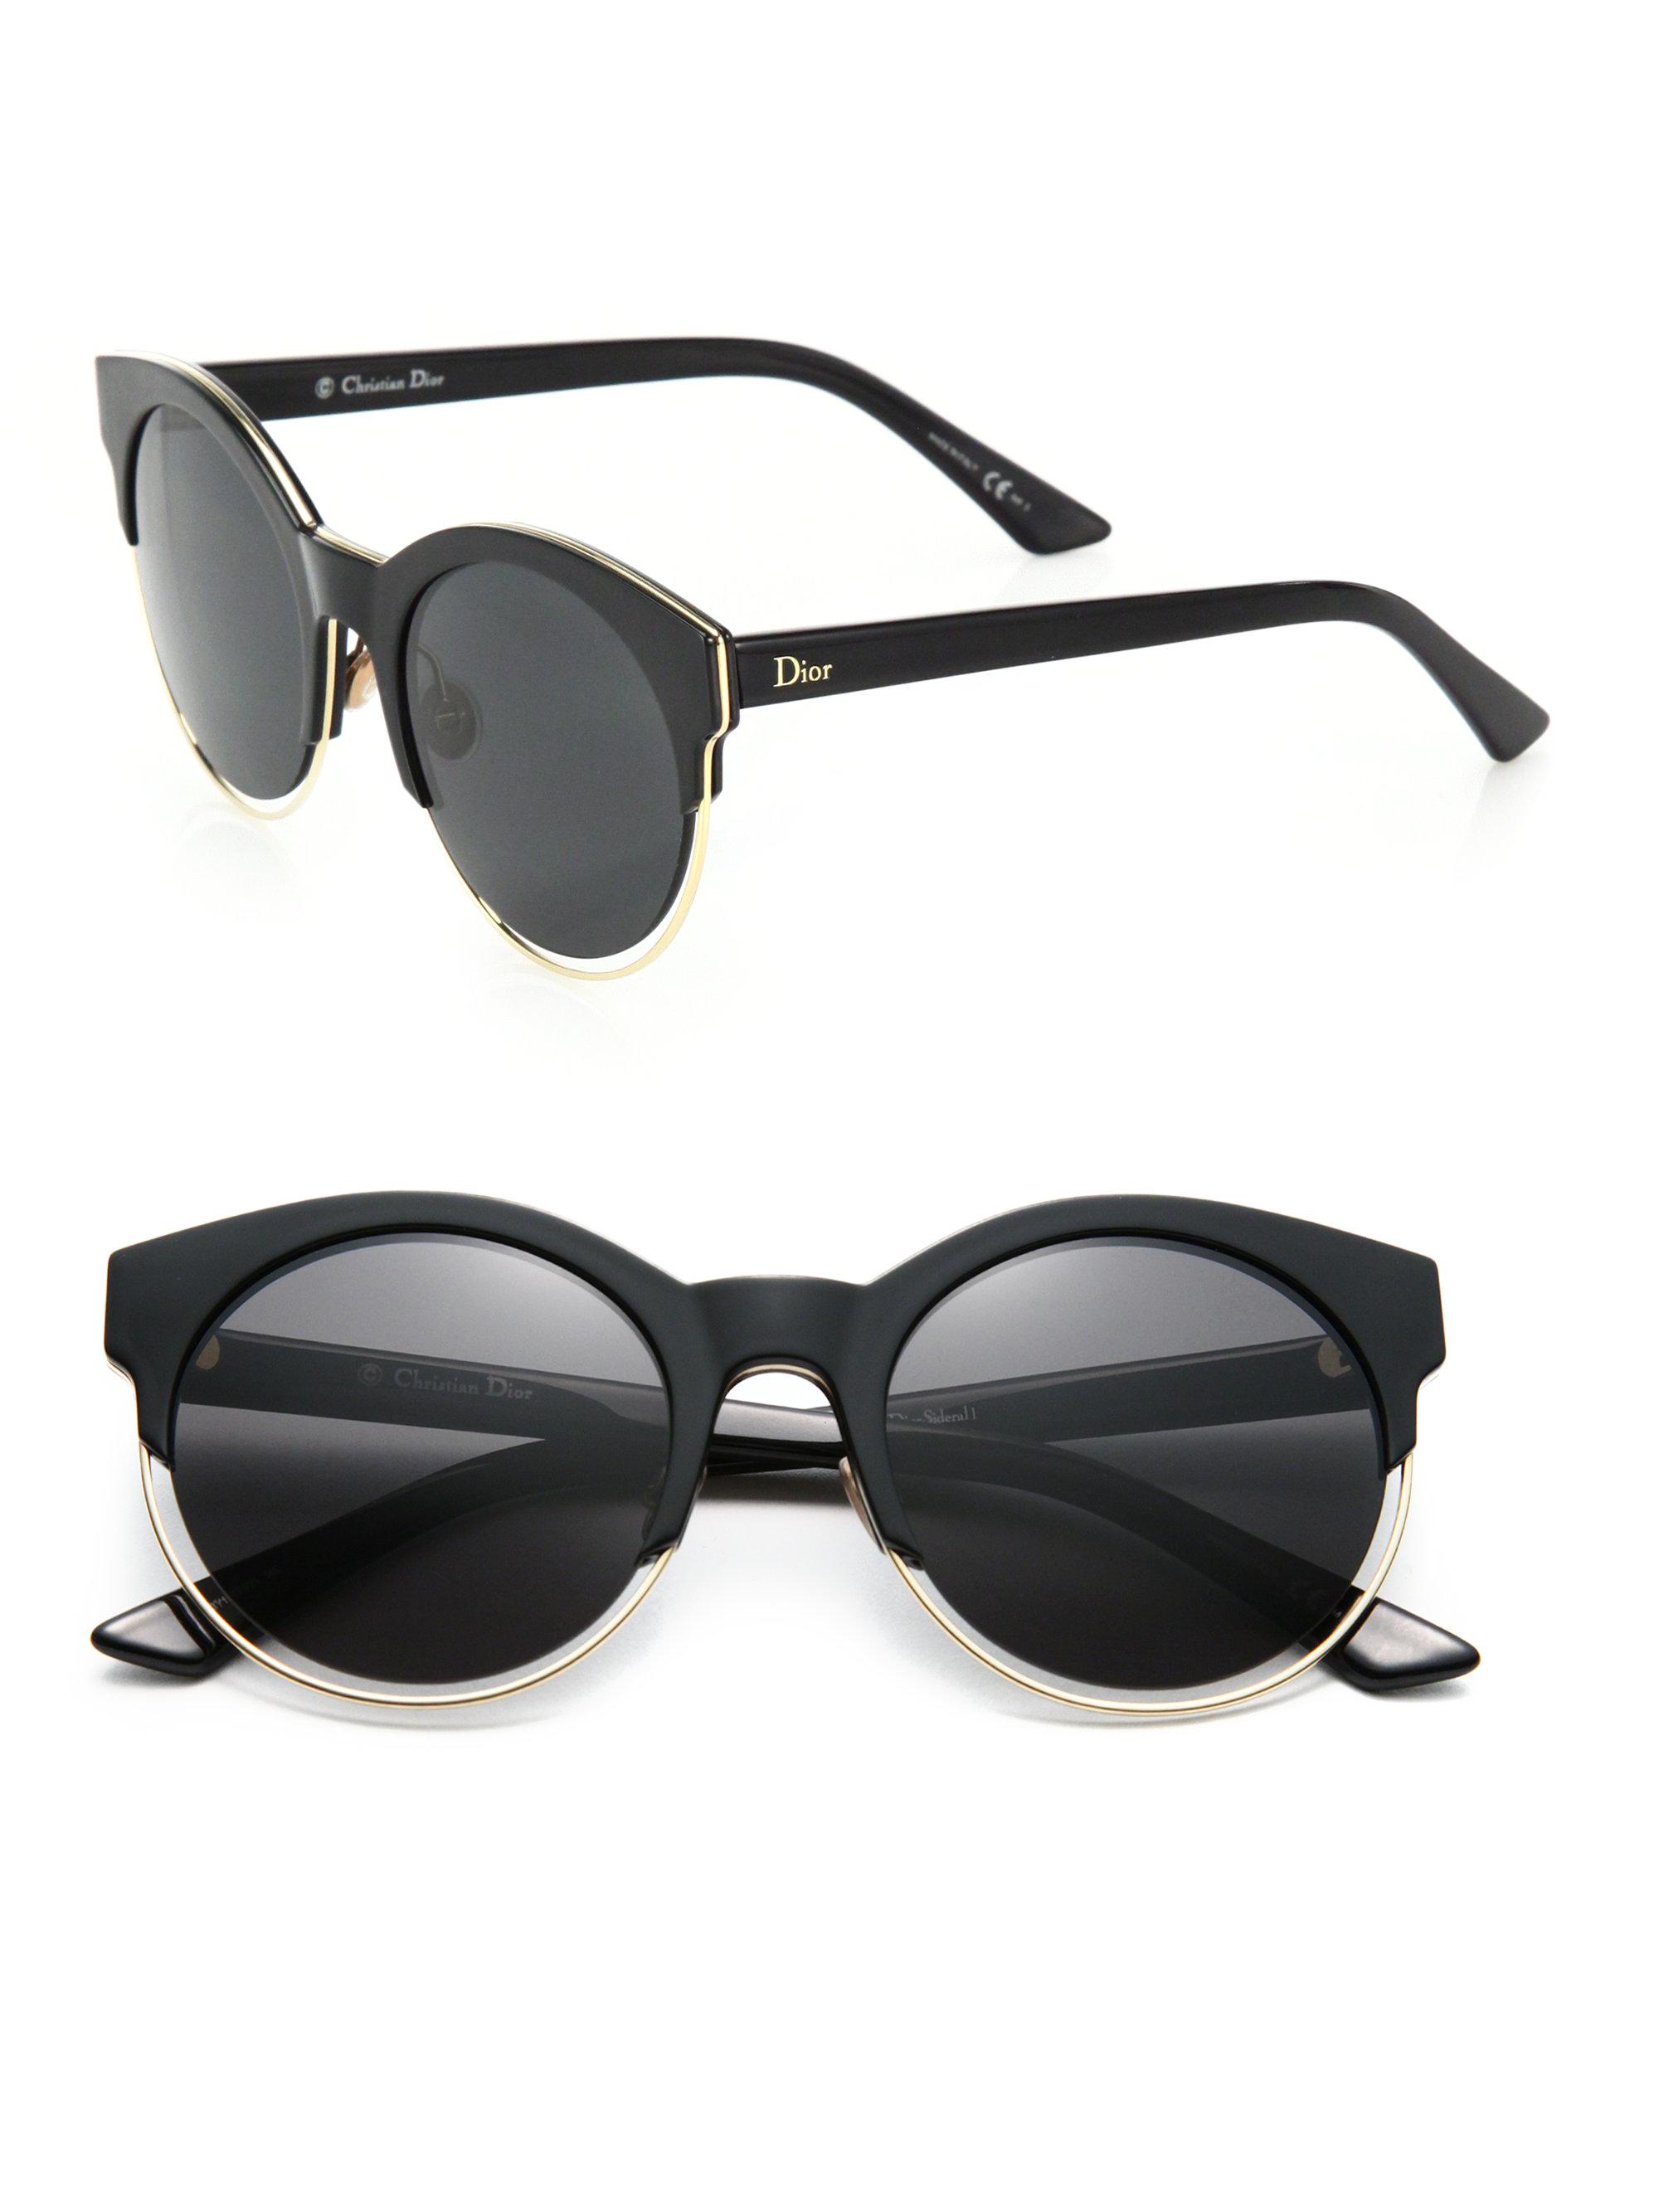 c2ea5c22444 Dior Black Sunglasses - Bitterroot Public Library